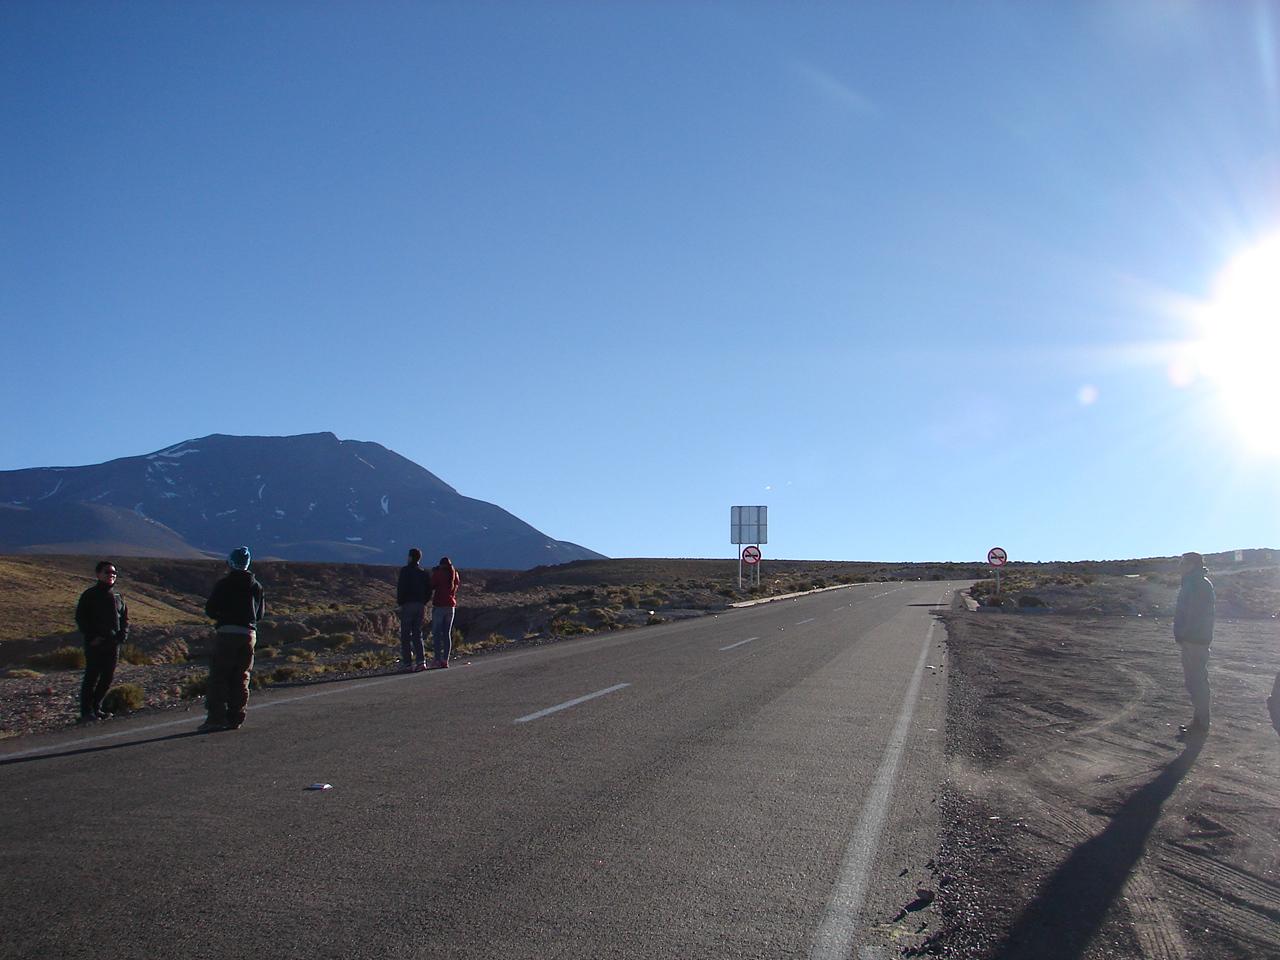 Pit stop na estrada para fotos